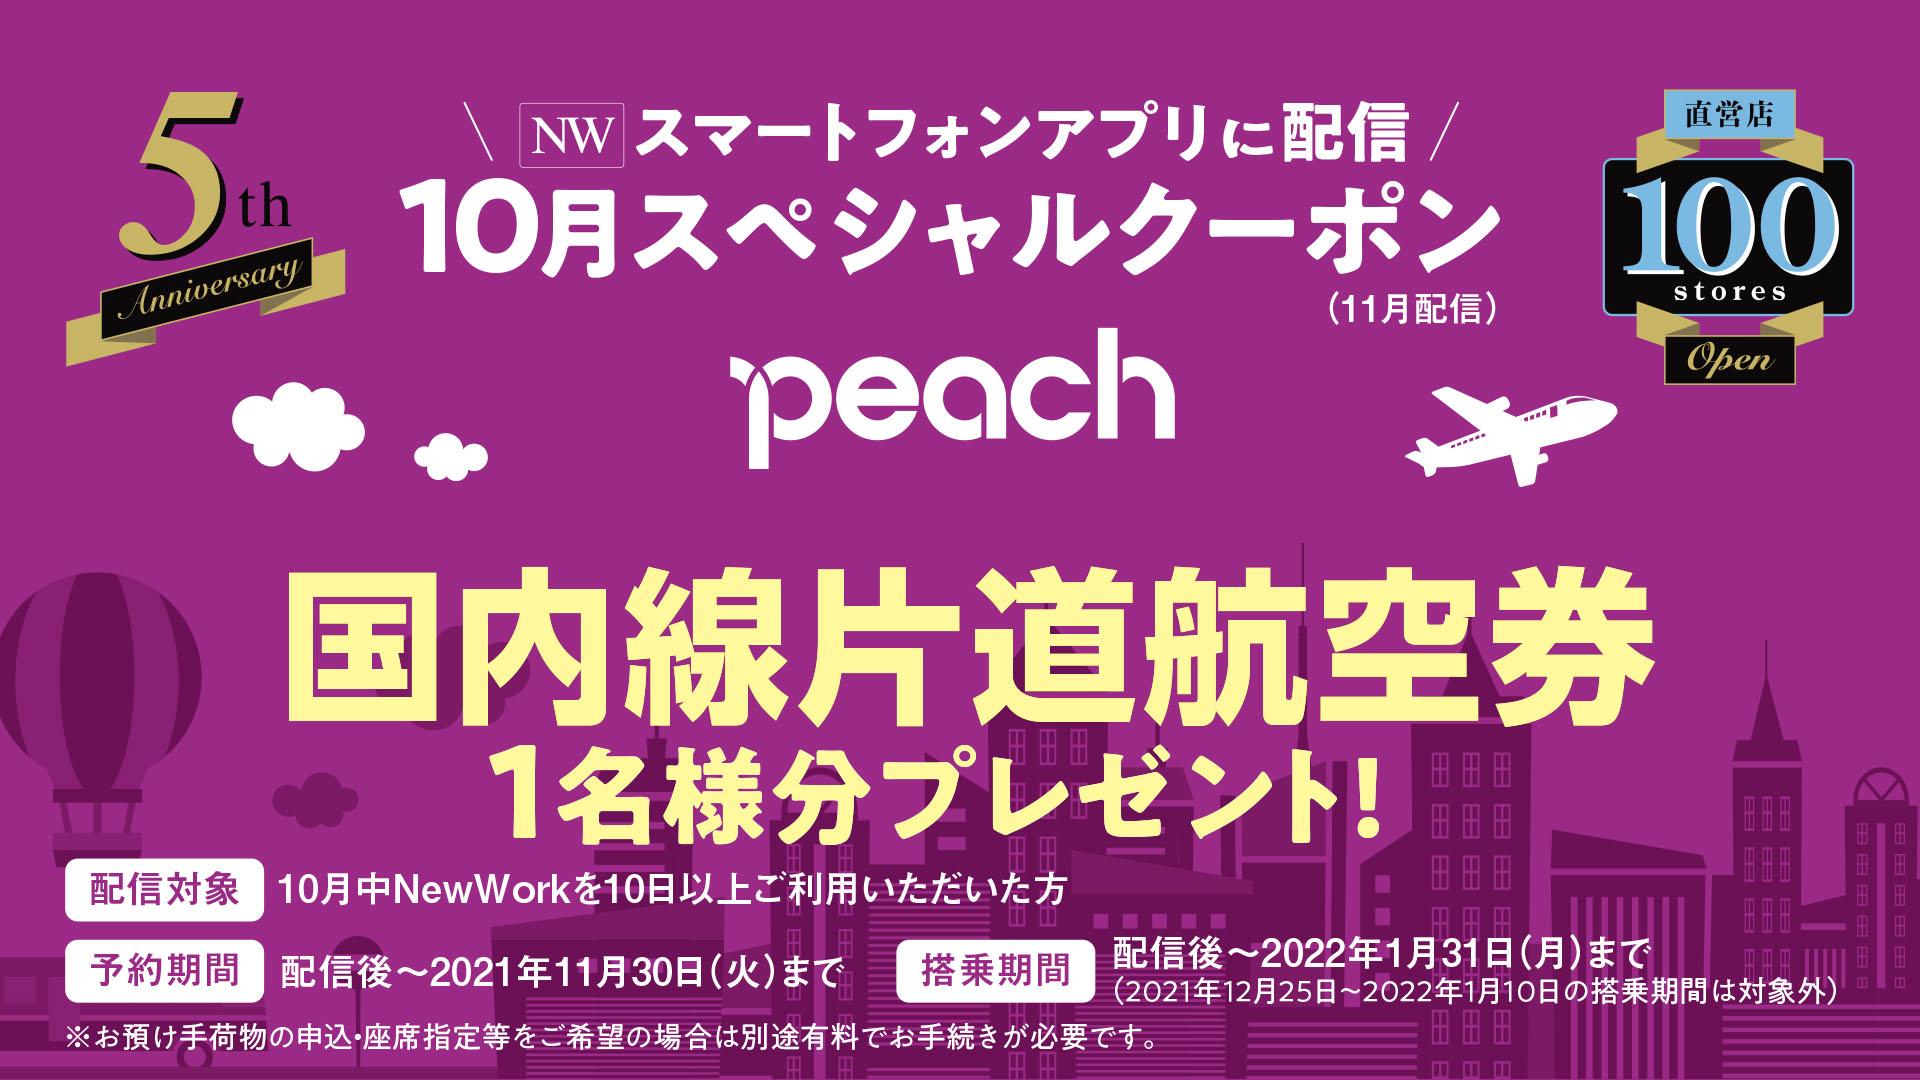 5thCP-3 Peach航空券